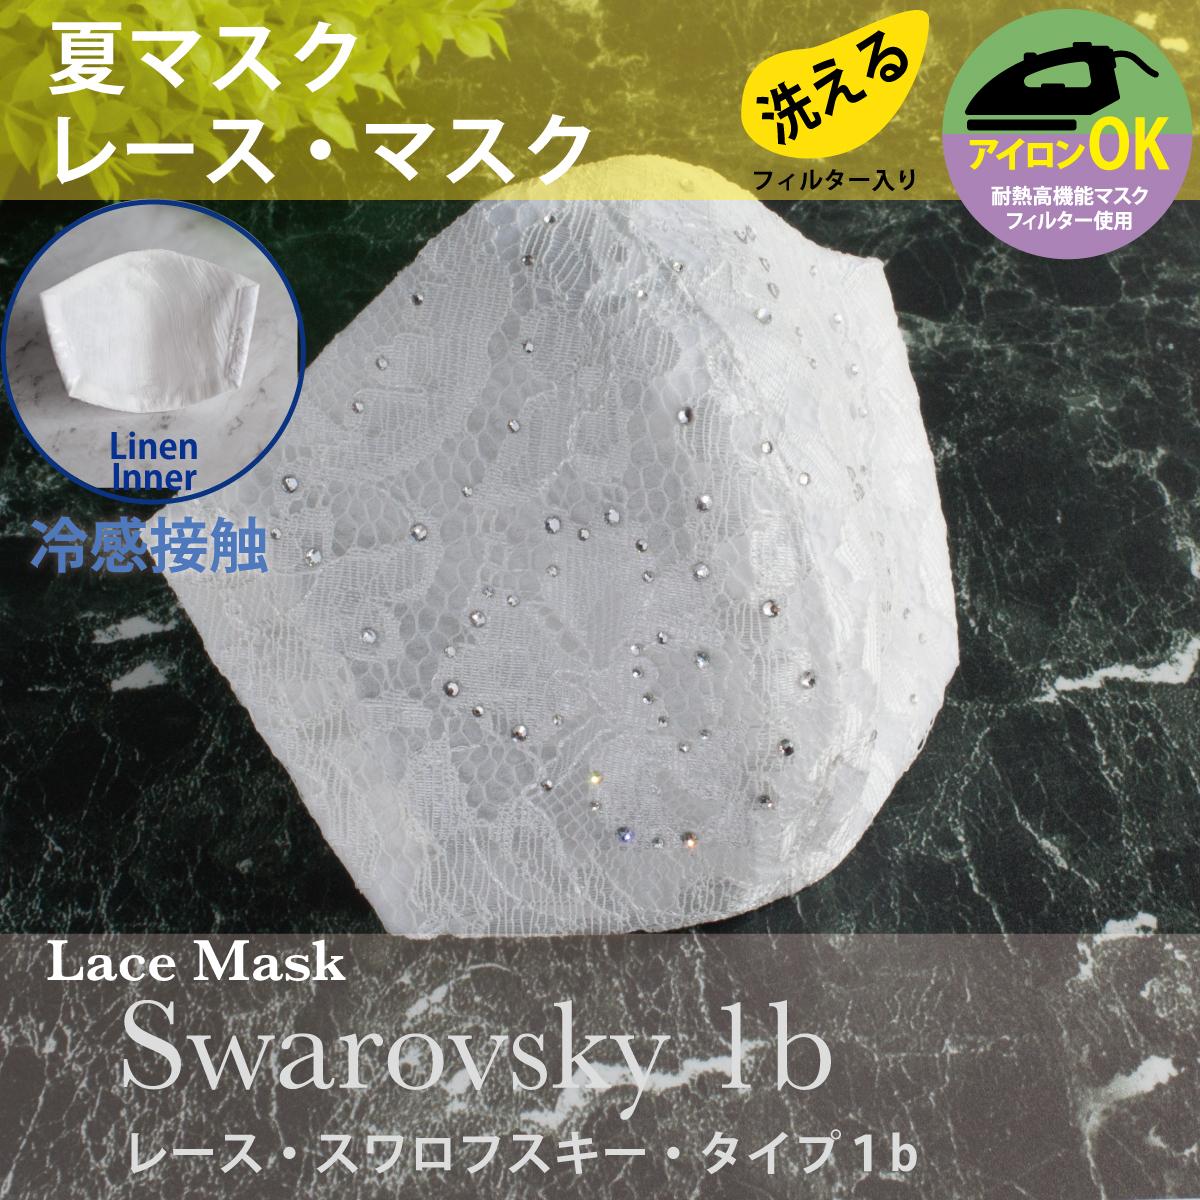 PSNY スワロフスキー レース・ホワイト 1b 花粉 黄砂 洗える不織布フィルター入り 立体 大人用 マスク 送料無料 LM3